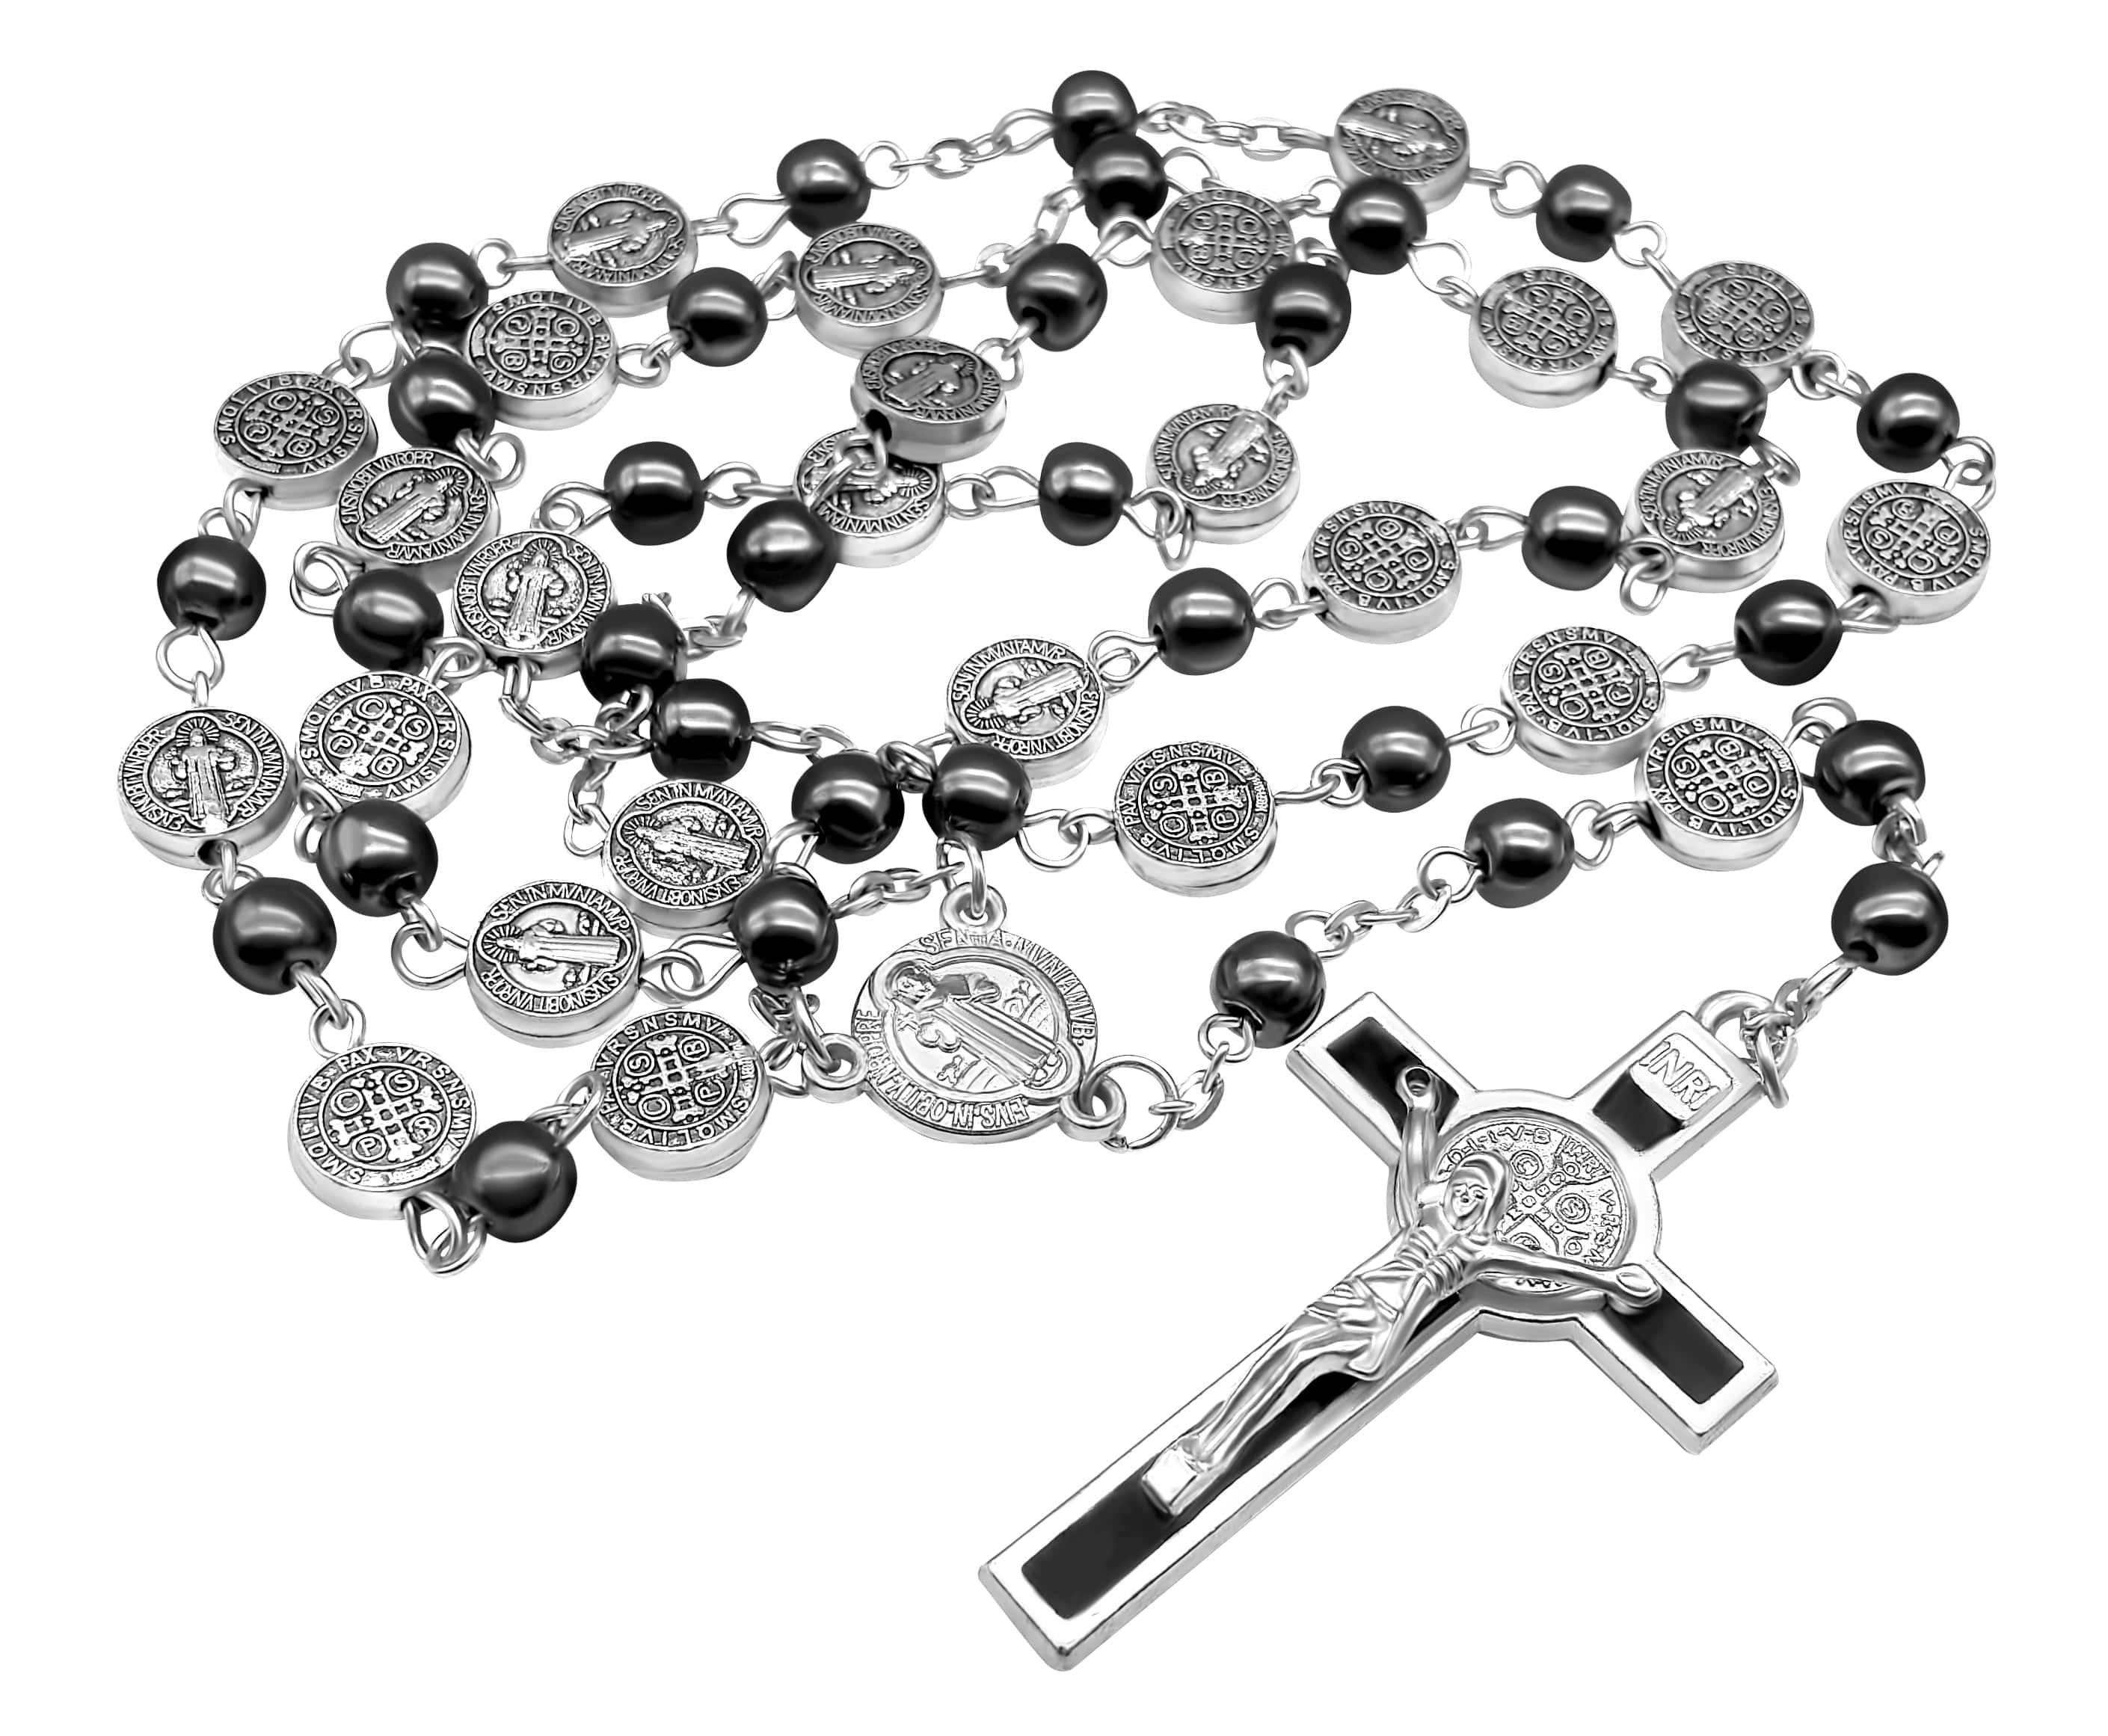 7c4e68c44c8 Black Rosary Hematite Beads Catholic Necklace St Benedict Chaplet ...